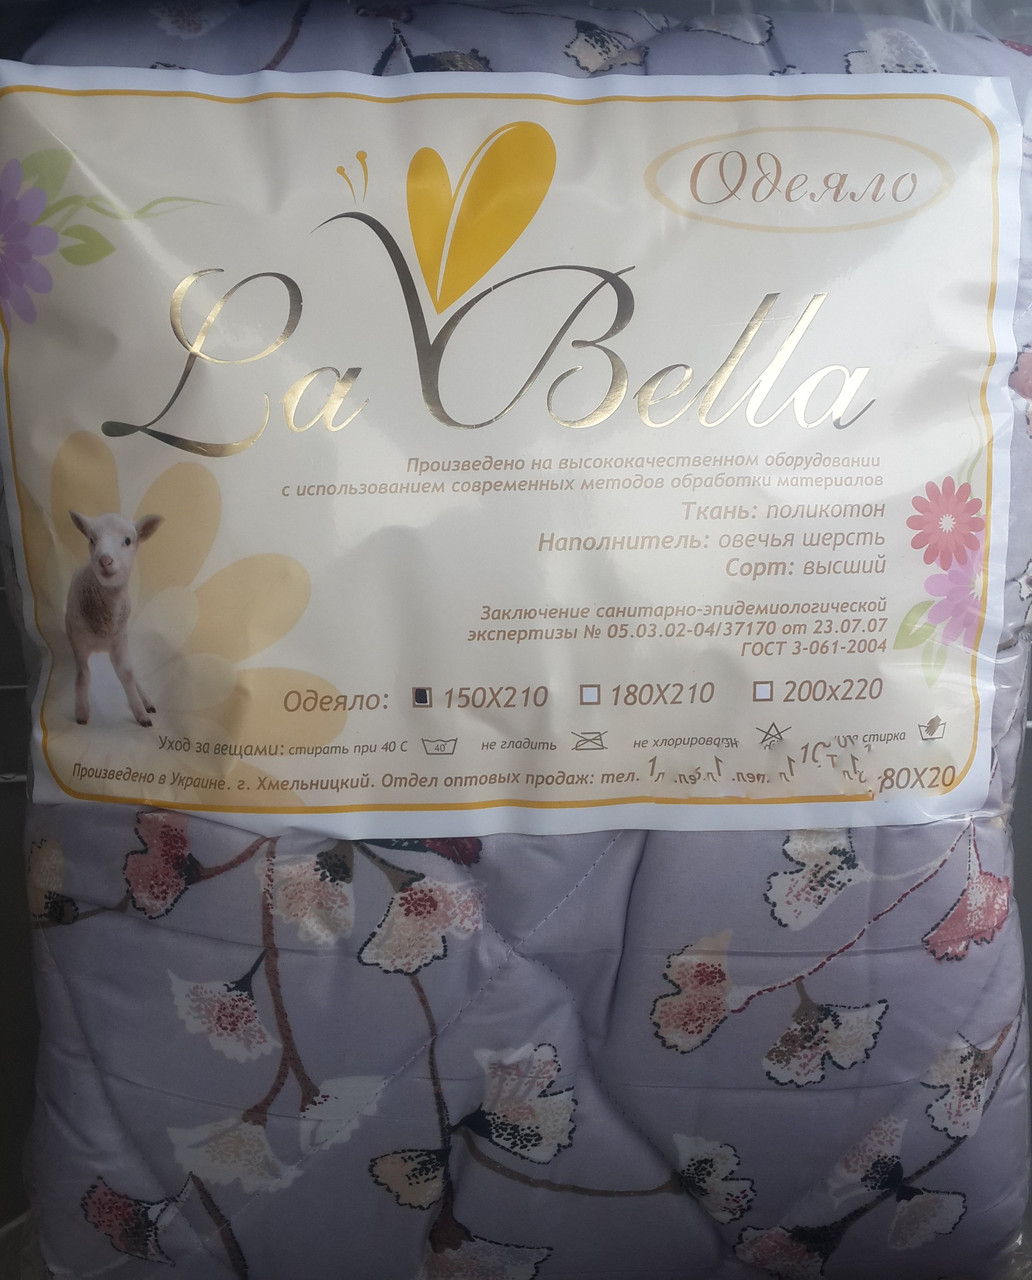 Одеяло полуторное на овчине La Bella по цене производителя